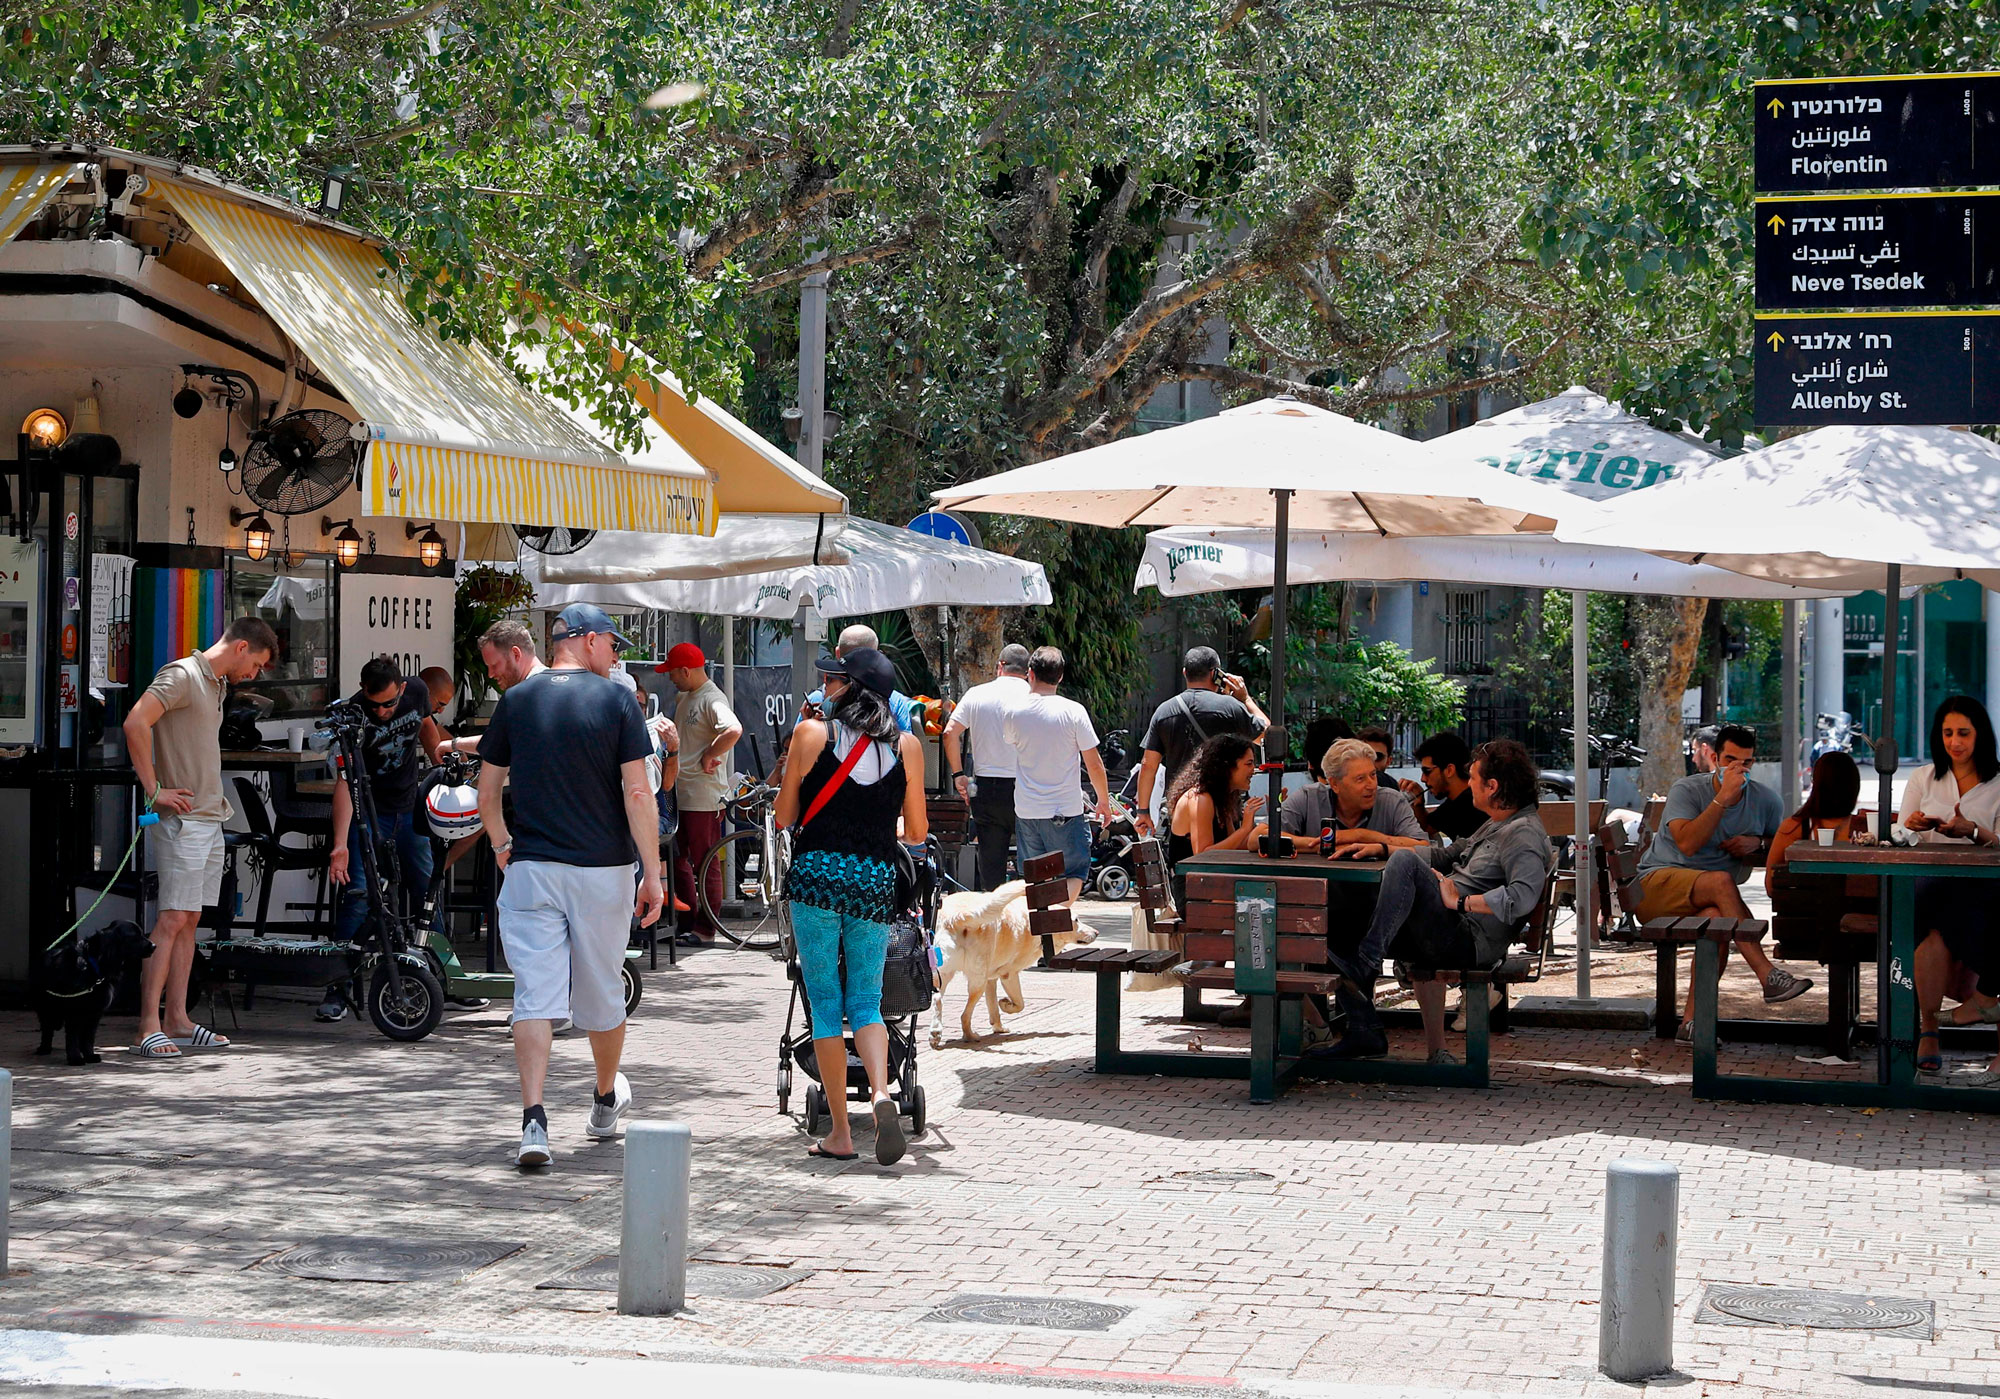 People sit outside a cafe in Israel's Mediterranean coastal city of Tel Aviv, Israel, on May 27.